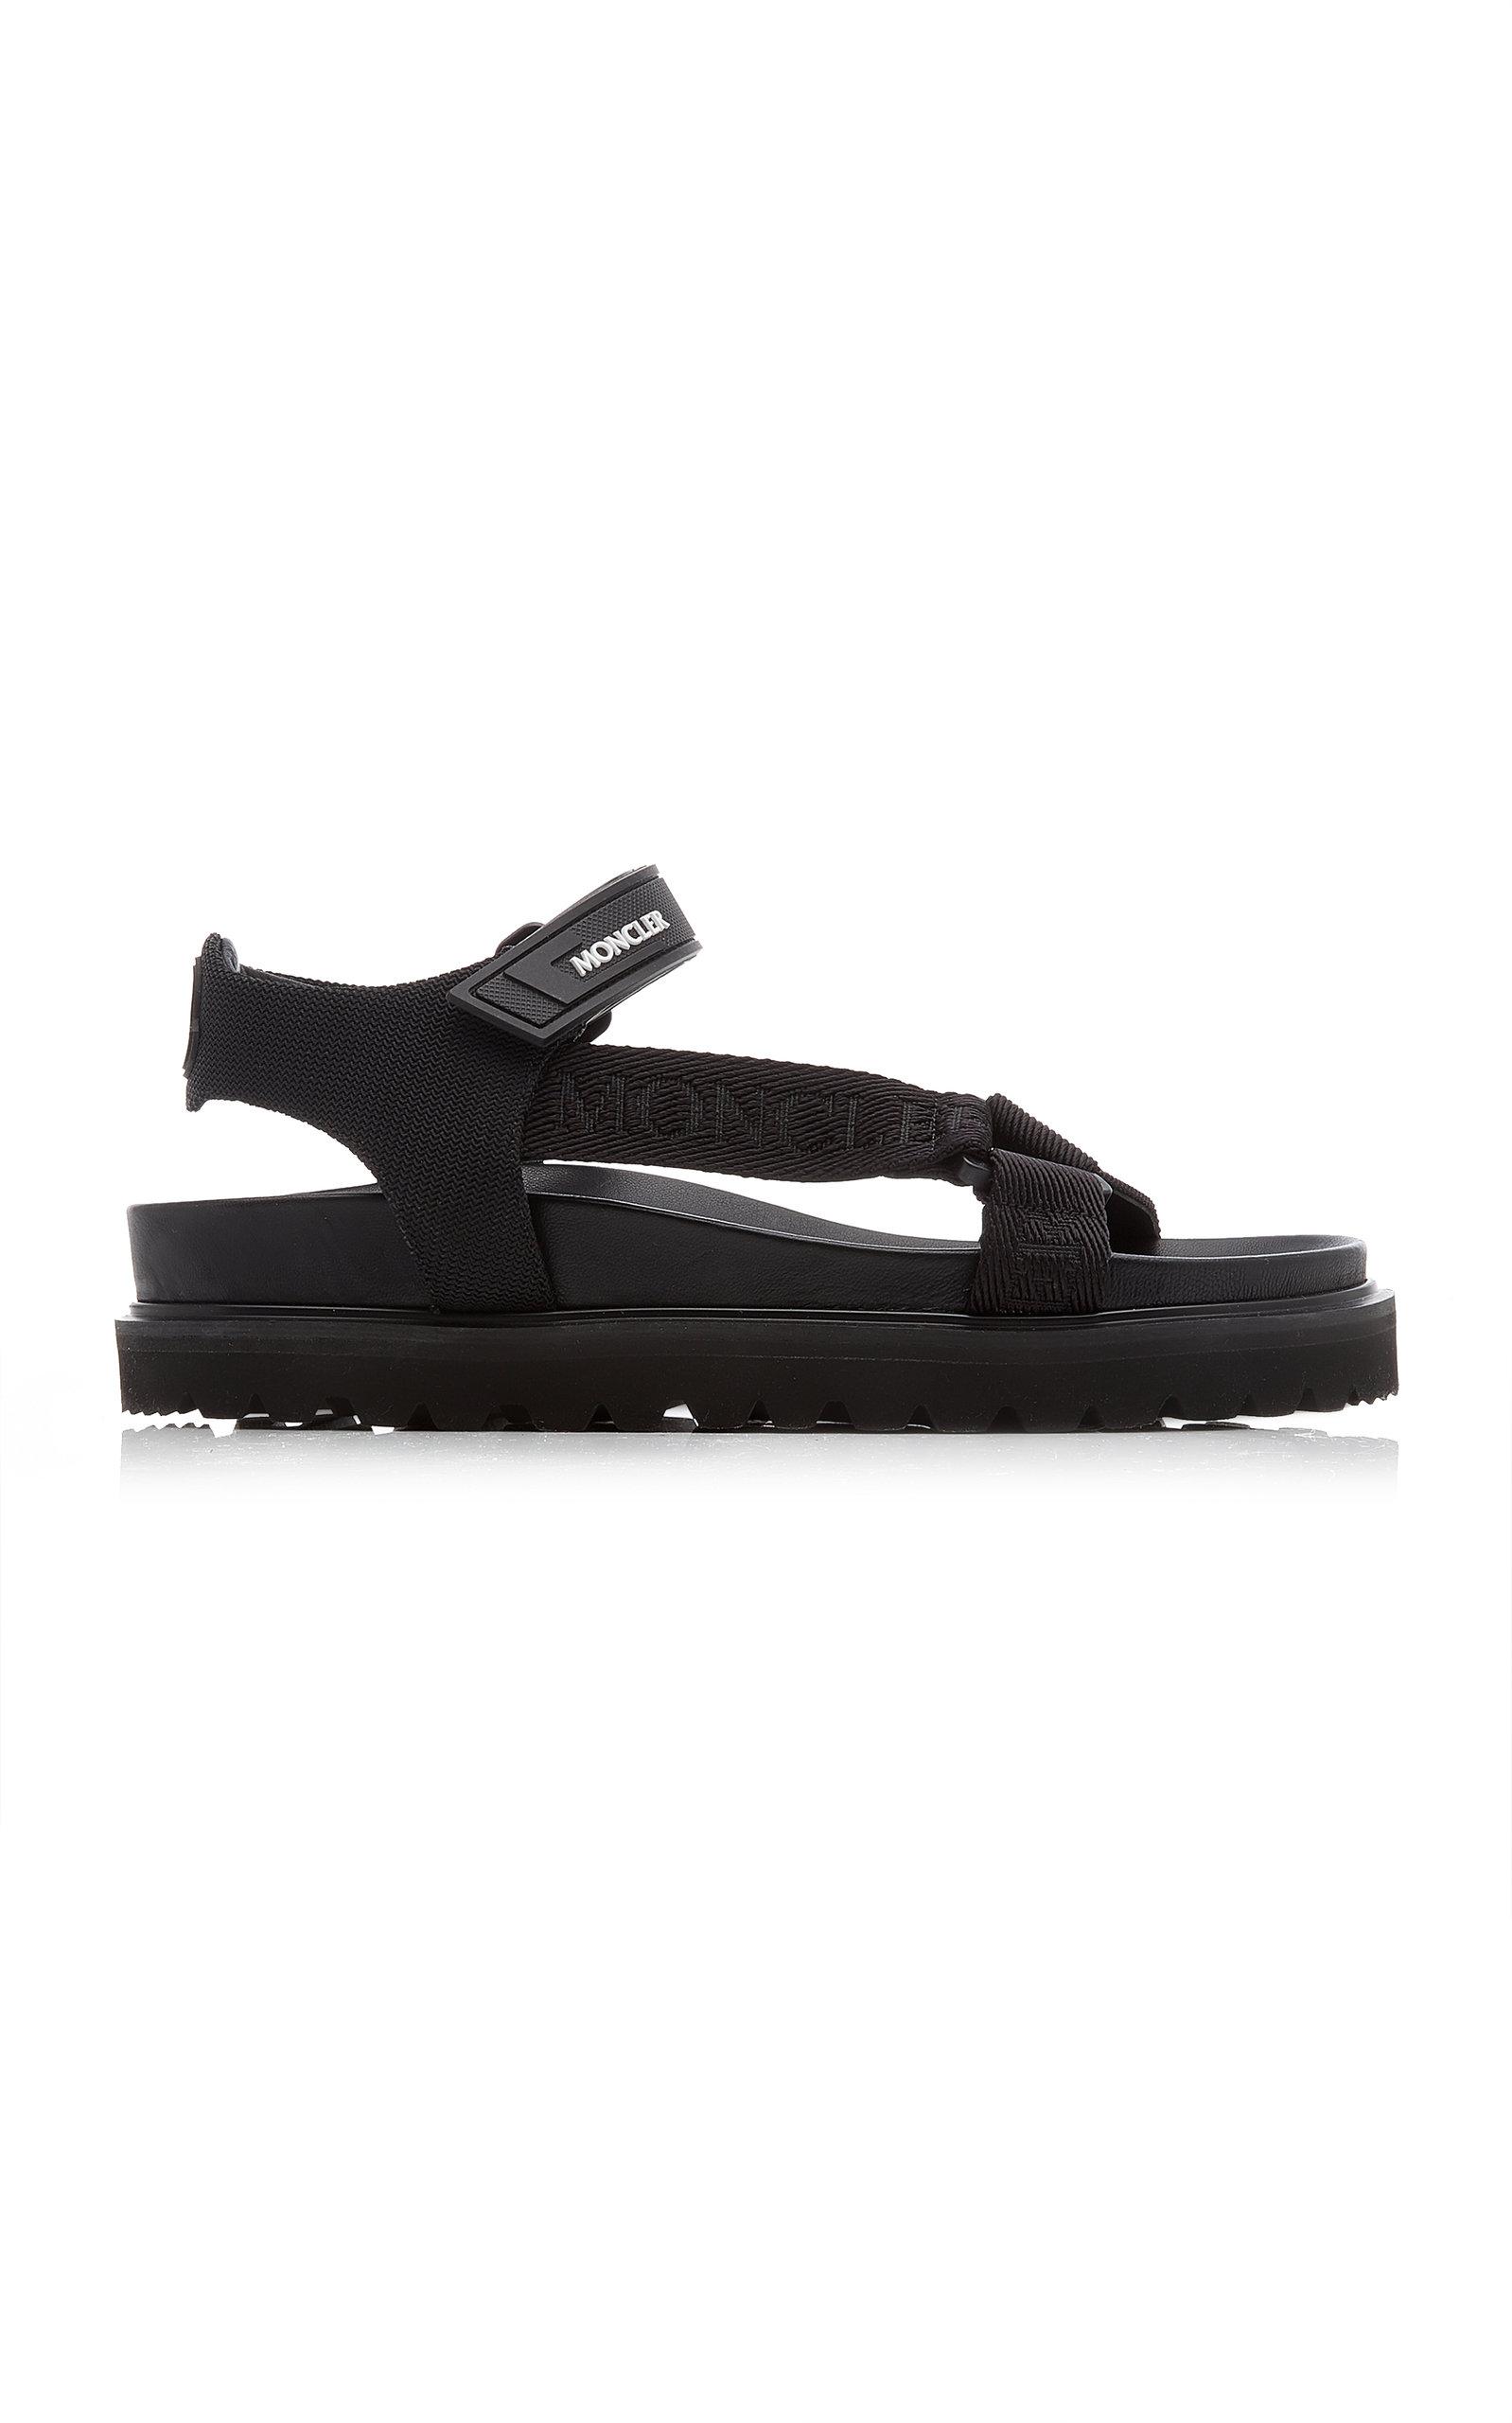 Moncler - Women's Flavia Webbed Hiking Sandals - Black/white - Moda Operandi